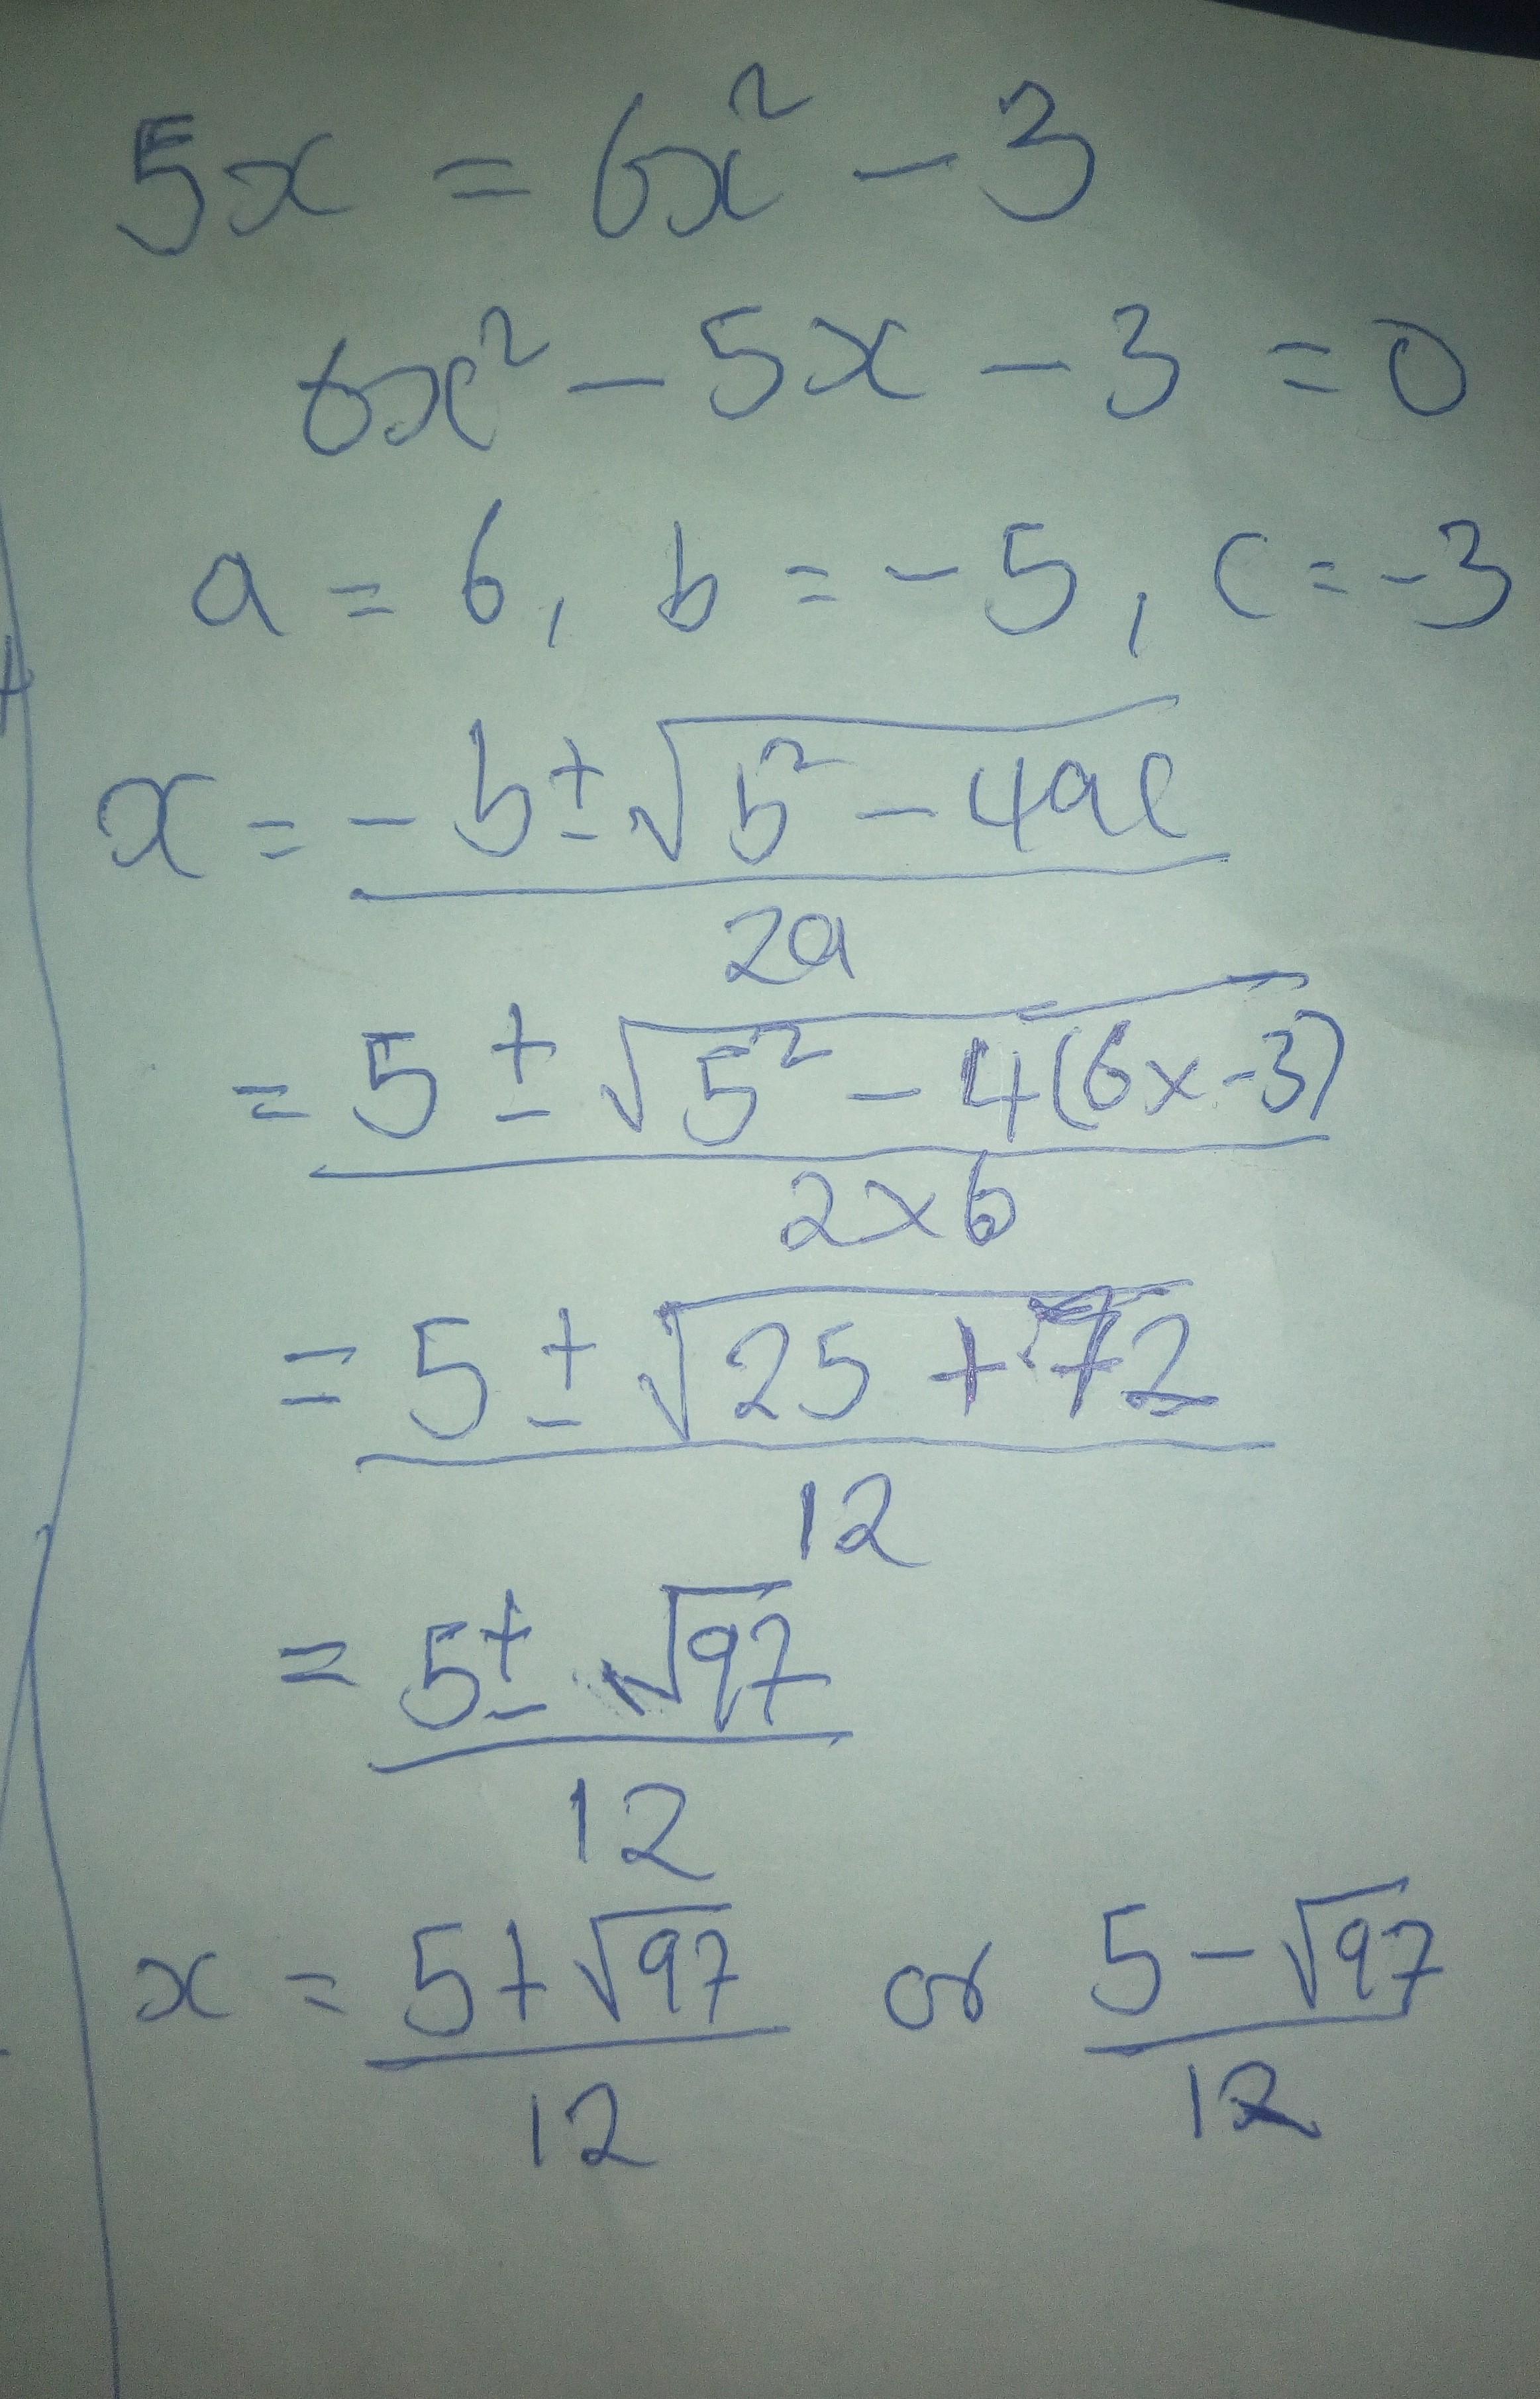 Using The Quadratic Formula To Solve 5x = 6x2 – 3, What